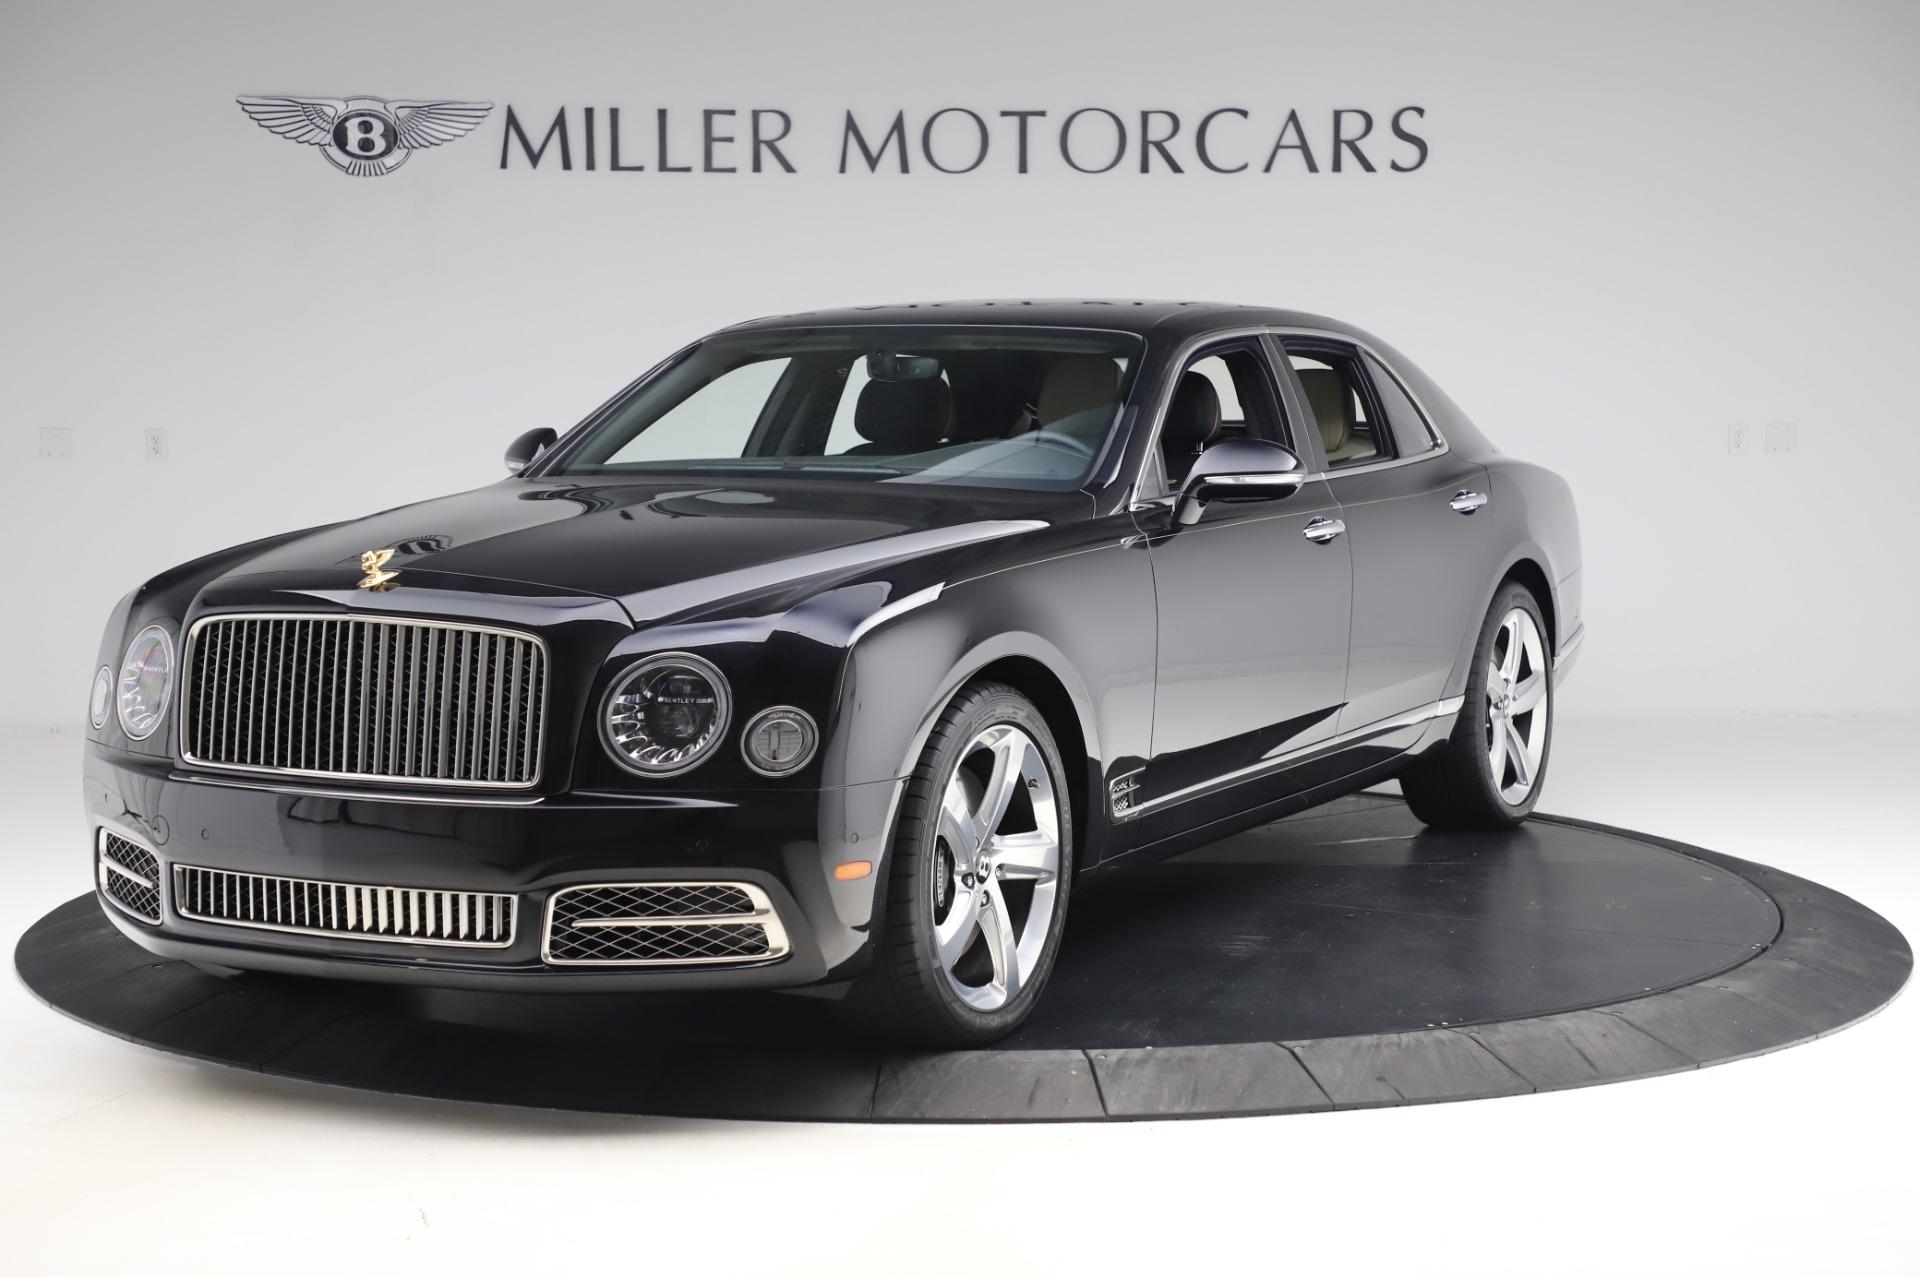 Used 2018 Bentley Mulsanne Speed for sale $239,900 at Rolls-Royce Motor Cars Greenwich in Greenwich CT 06830 1